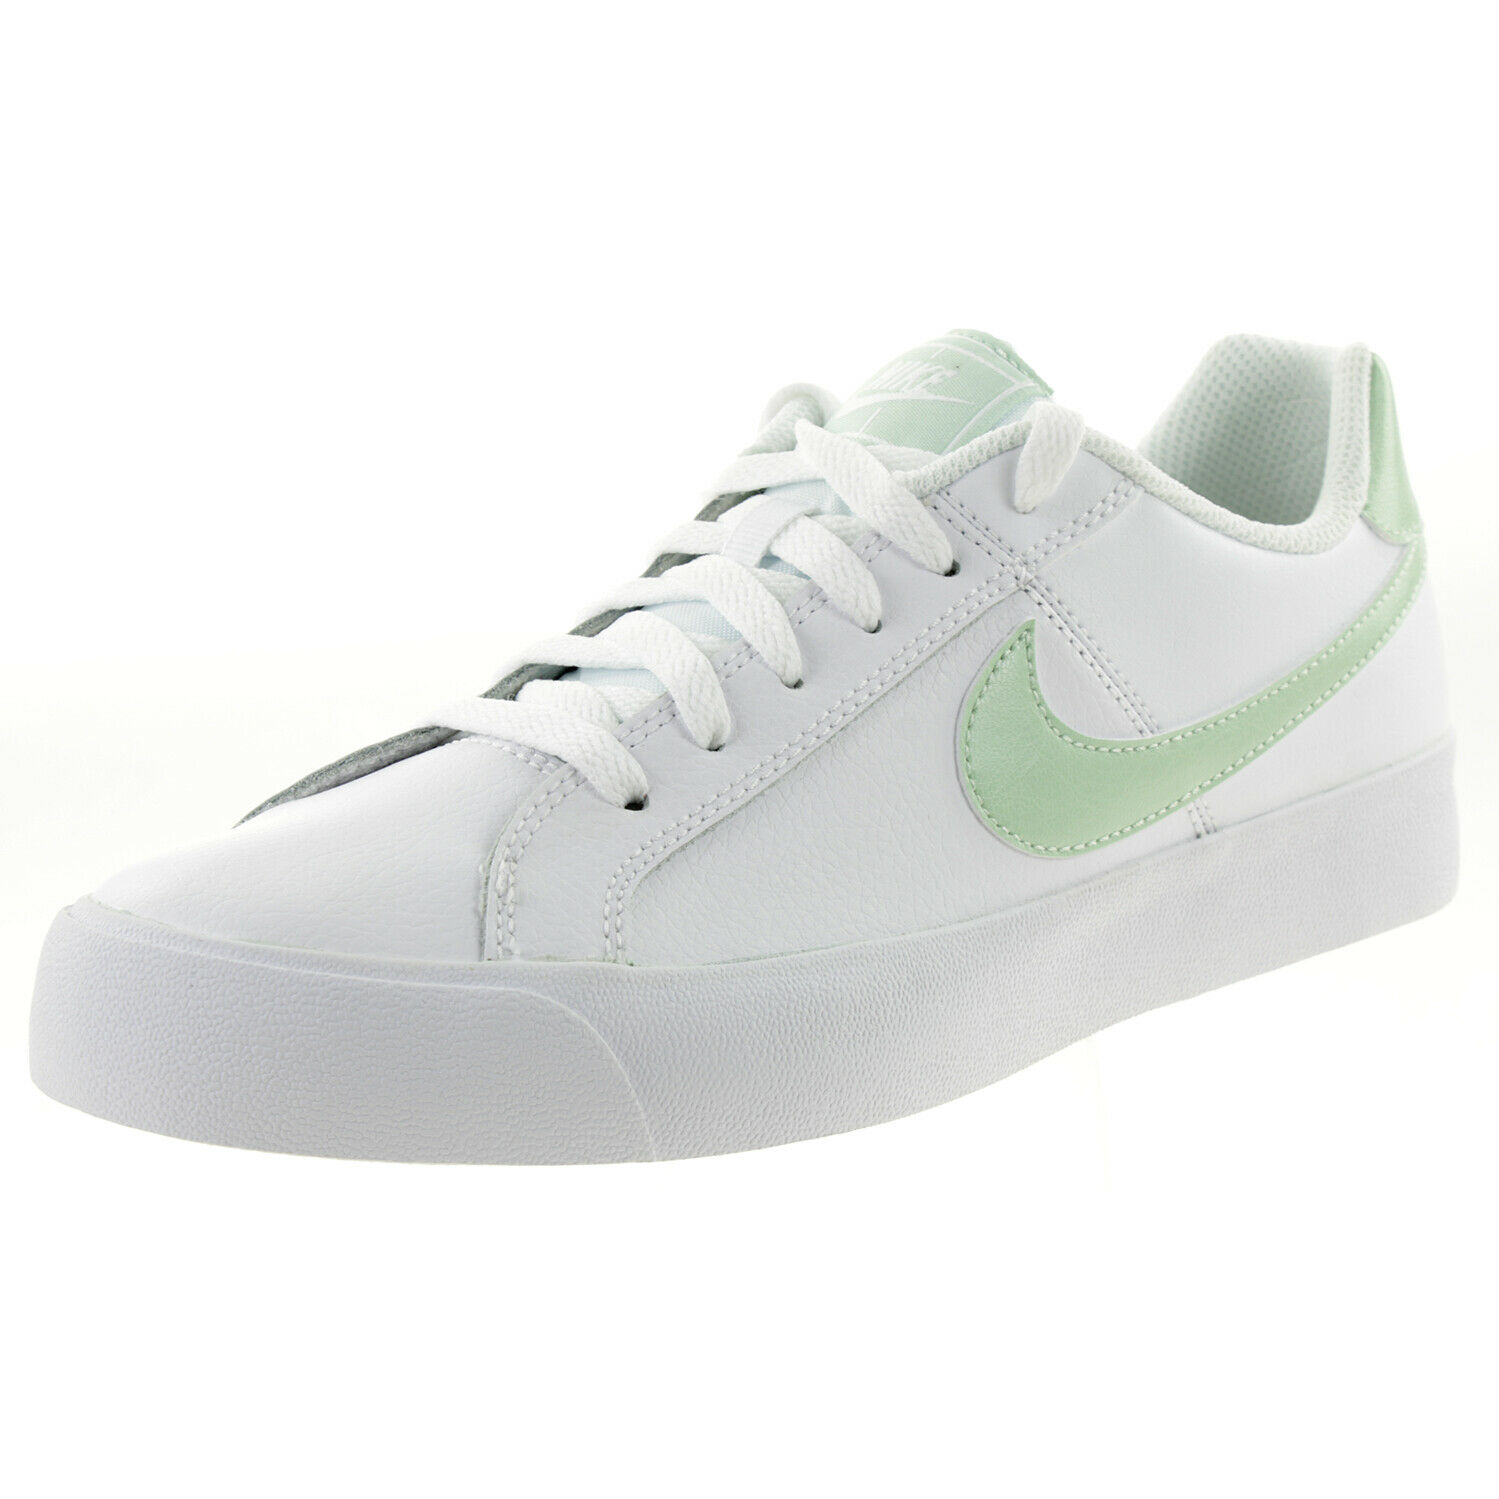 Nike Court Royale AC Sneaker Femmes Chaussures De Tennis Blanc ao2810 111